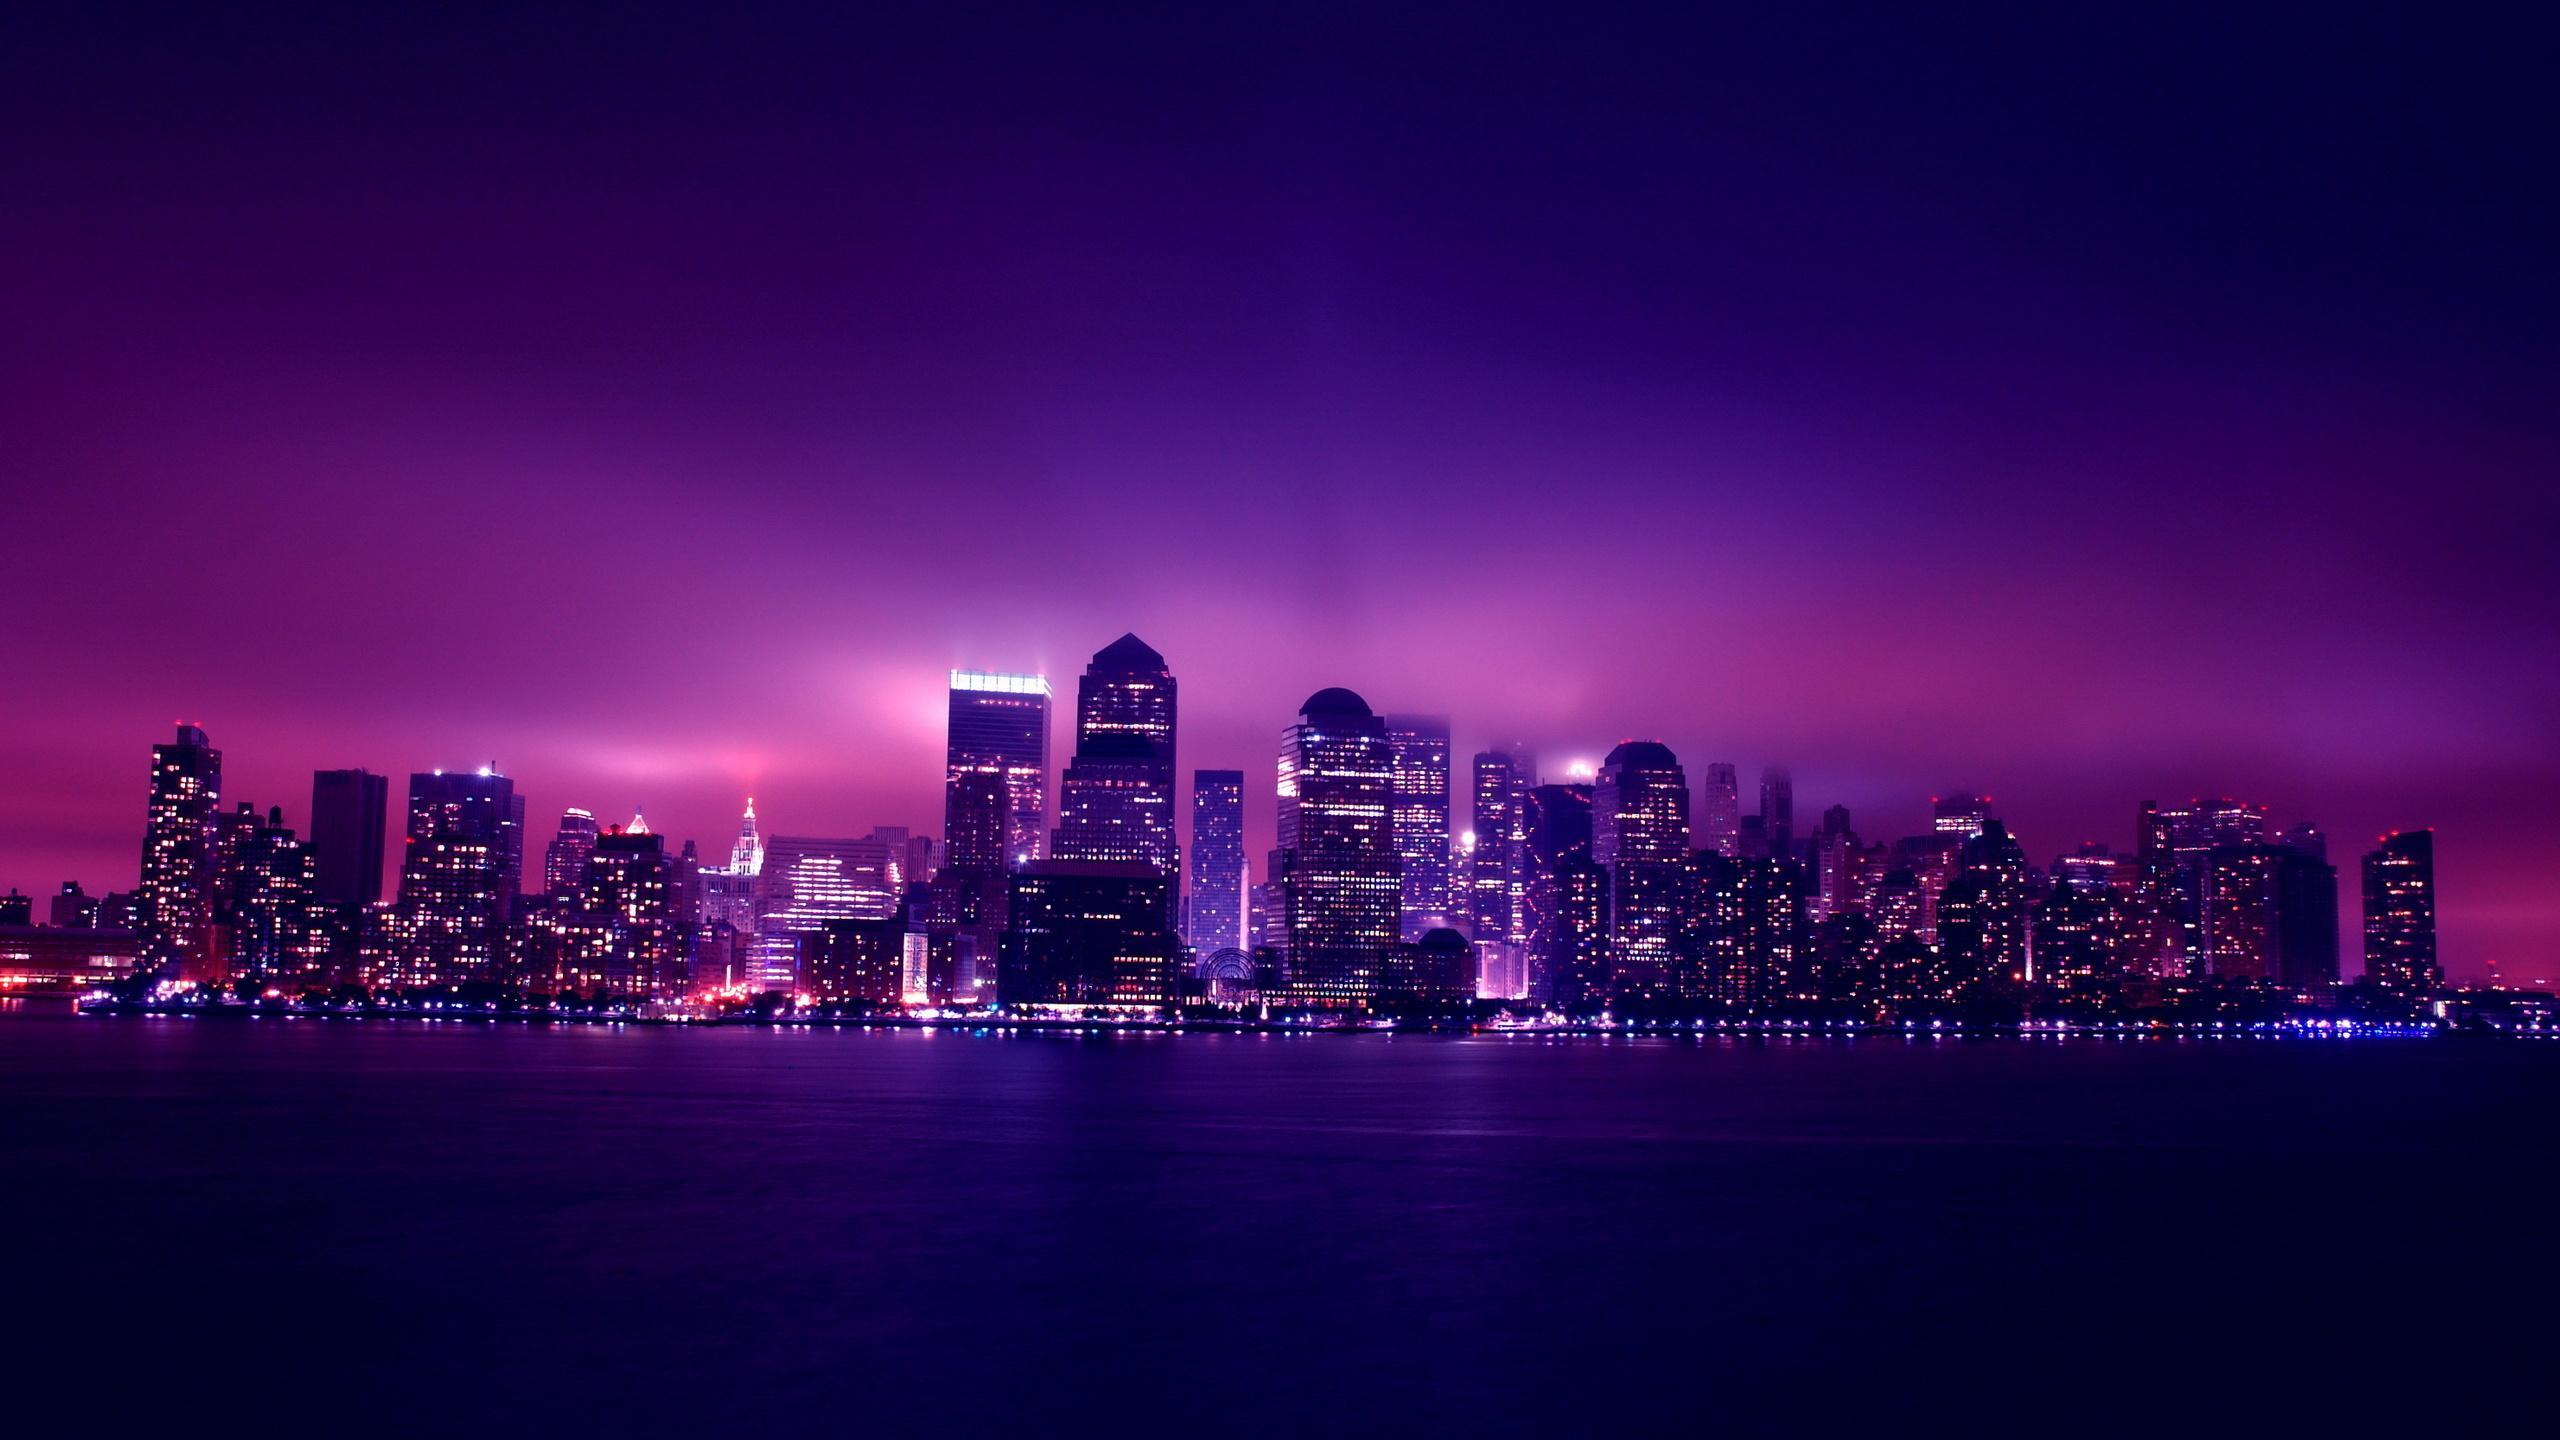 2560x1440 aesthetic city night lights 1440p resolution hd 4k